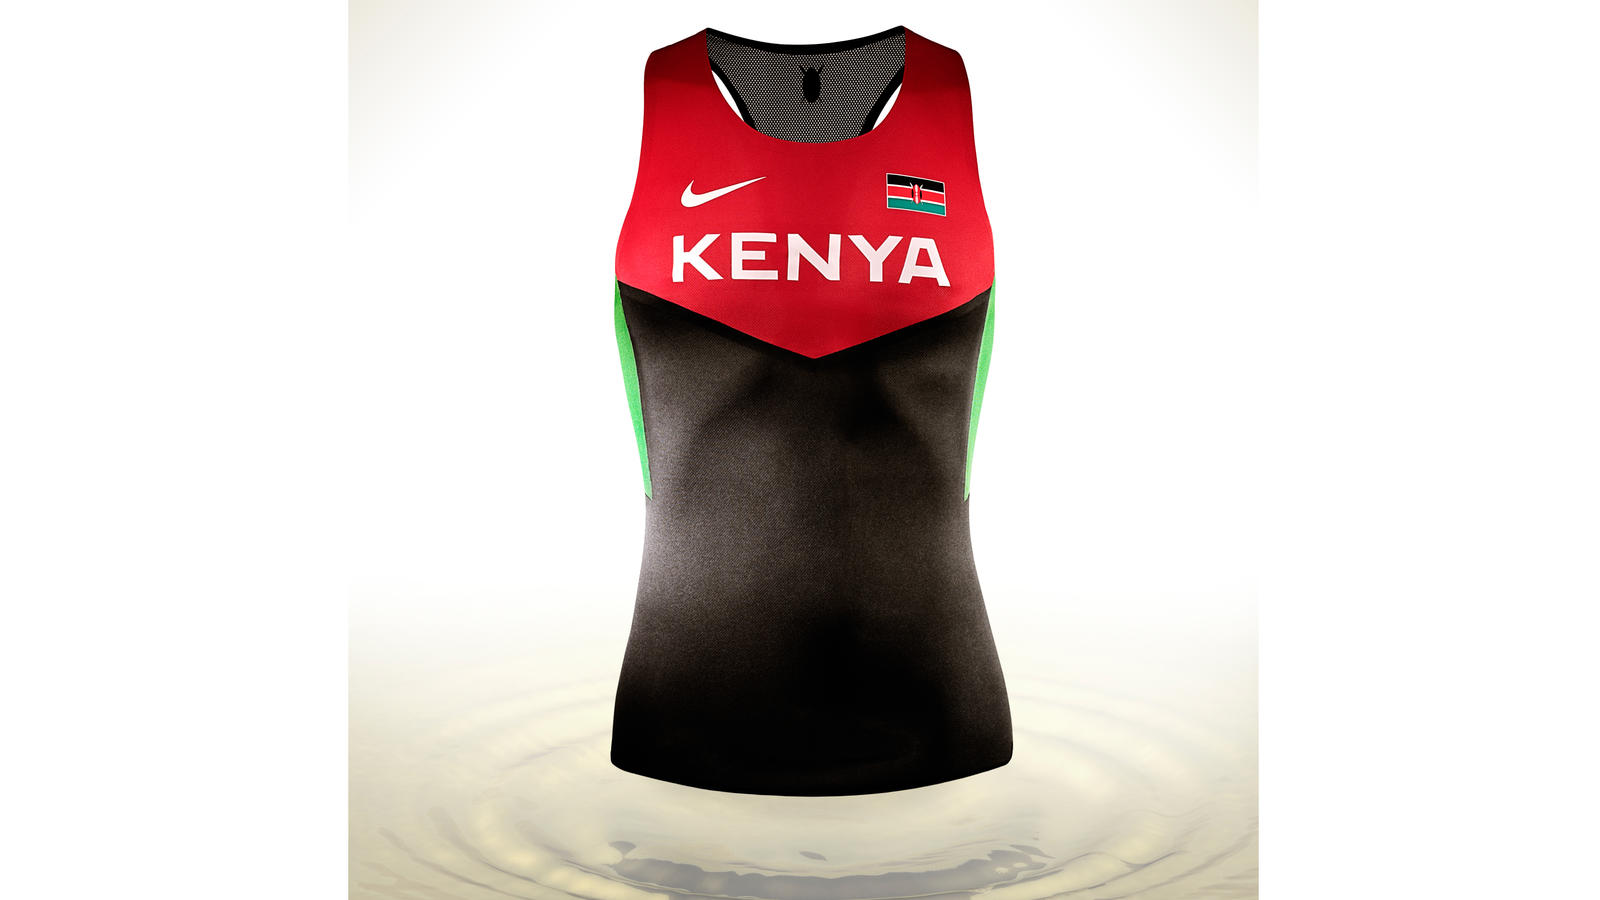 Nike News - Kenyan Marathon Champion to Wear Nike Uniform ...